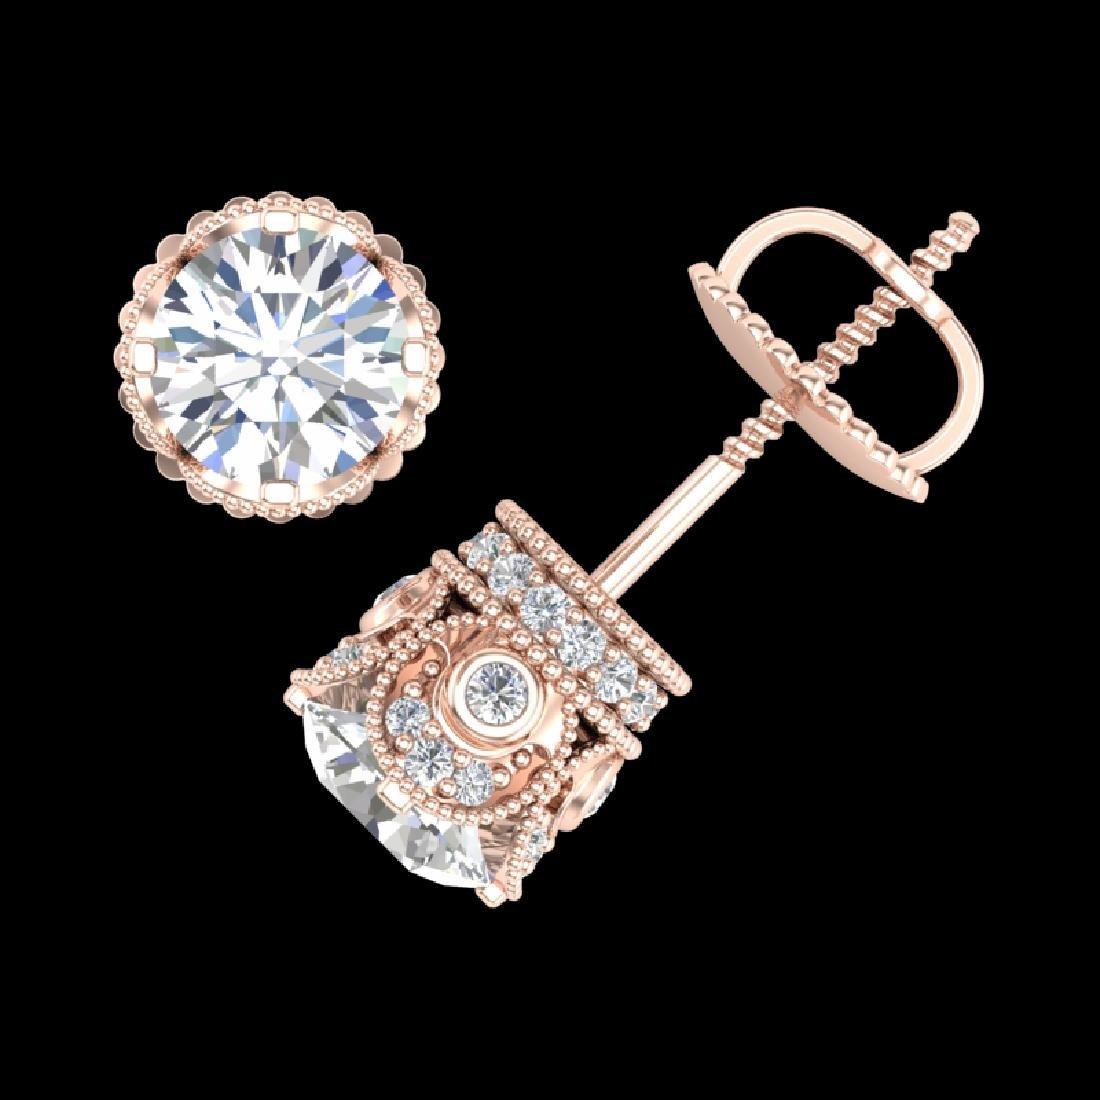 1.85 CTW VS/SI Diamond Solitaire Art Deco Stud Earrings